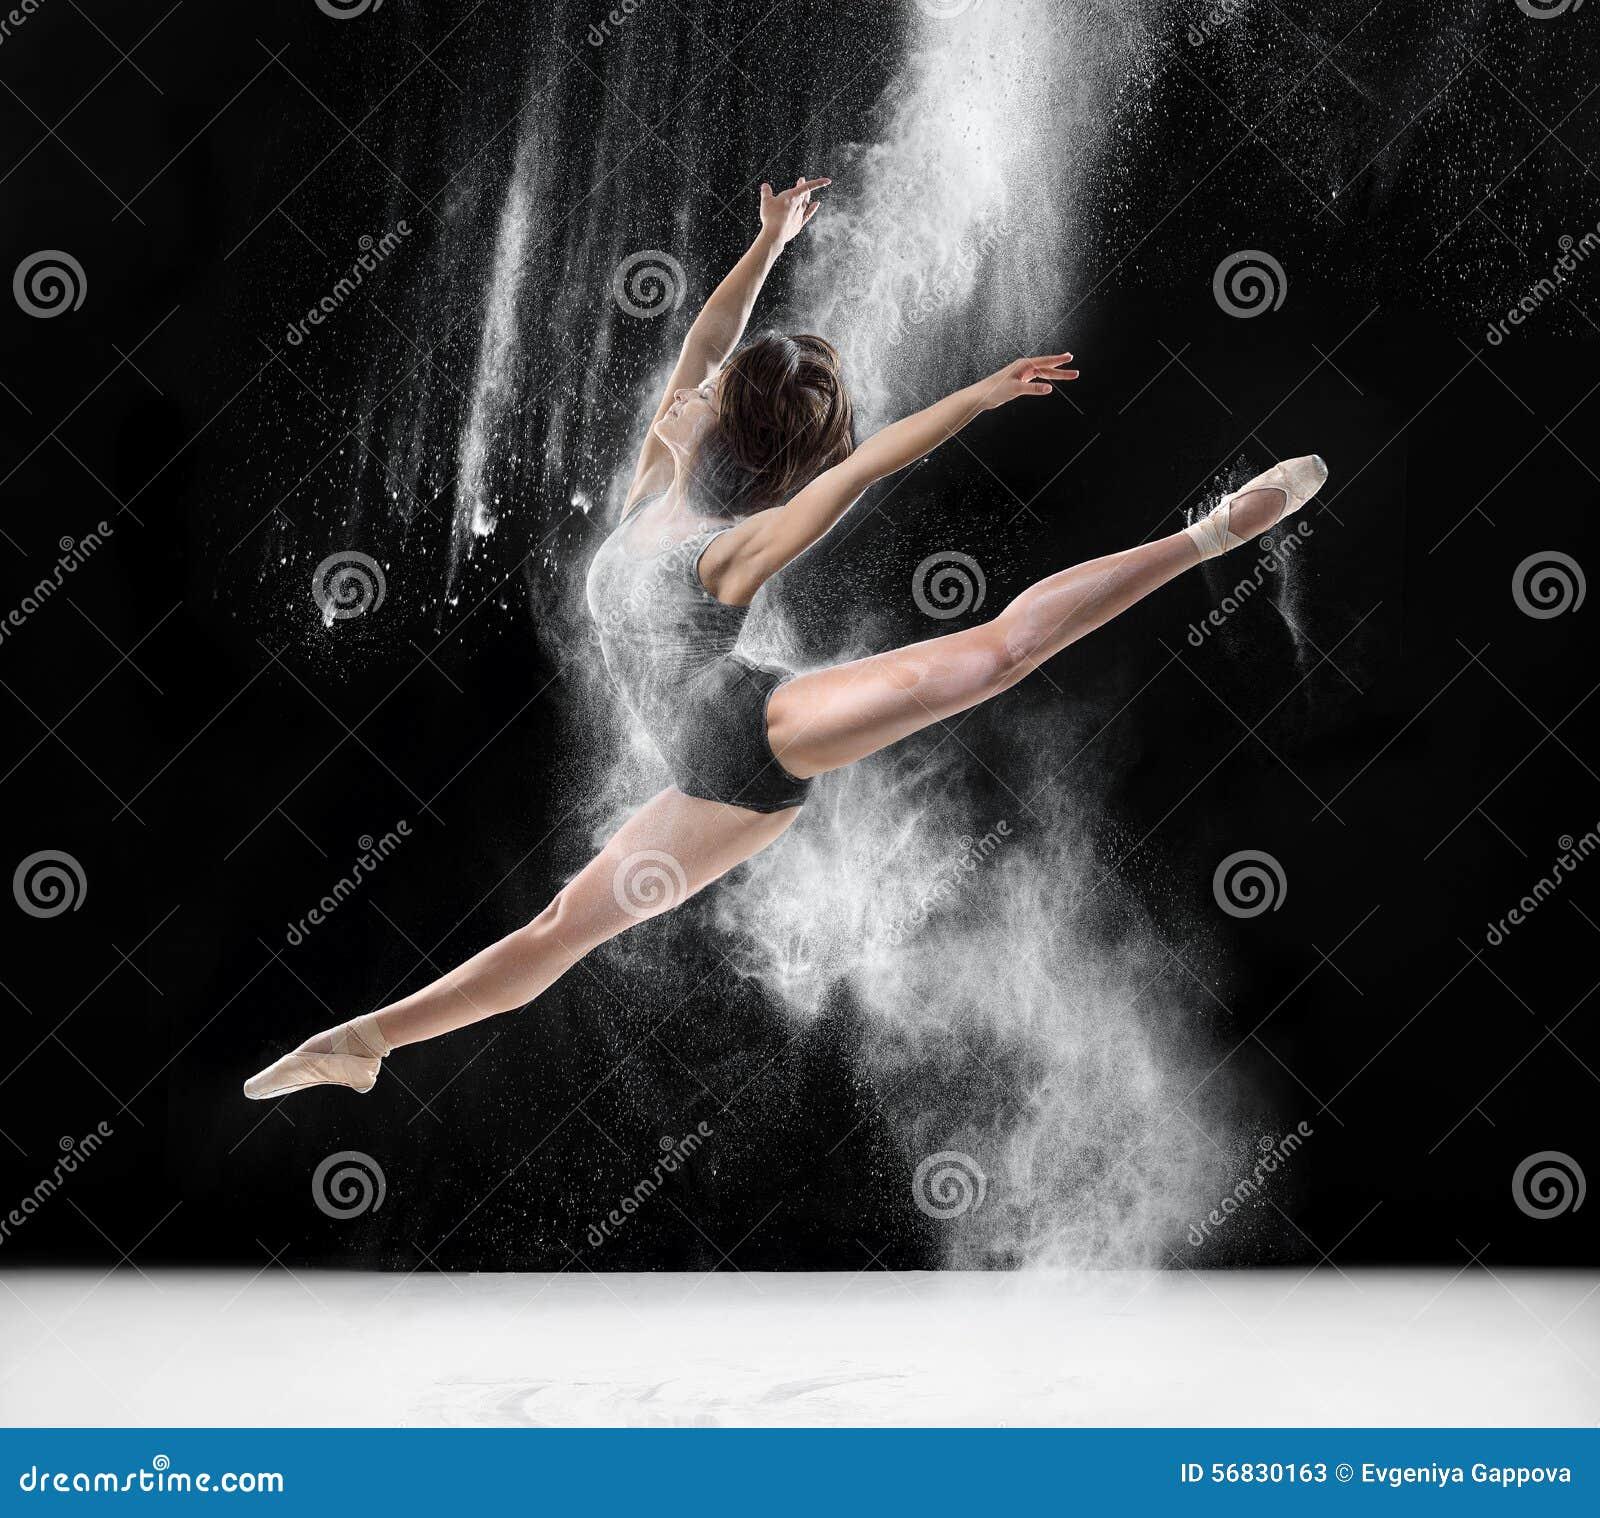 Balerina taniec z mąką, skok